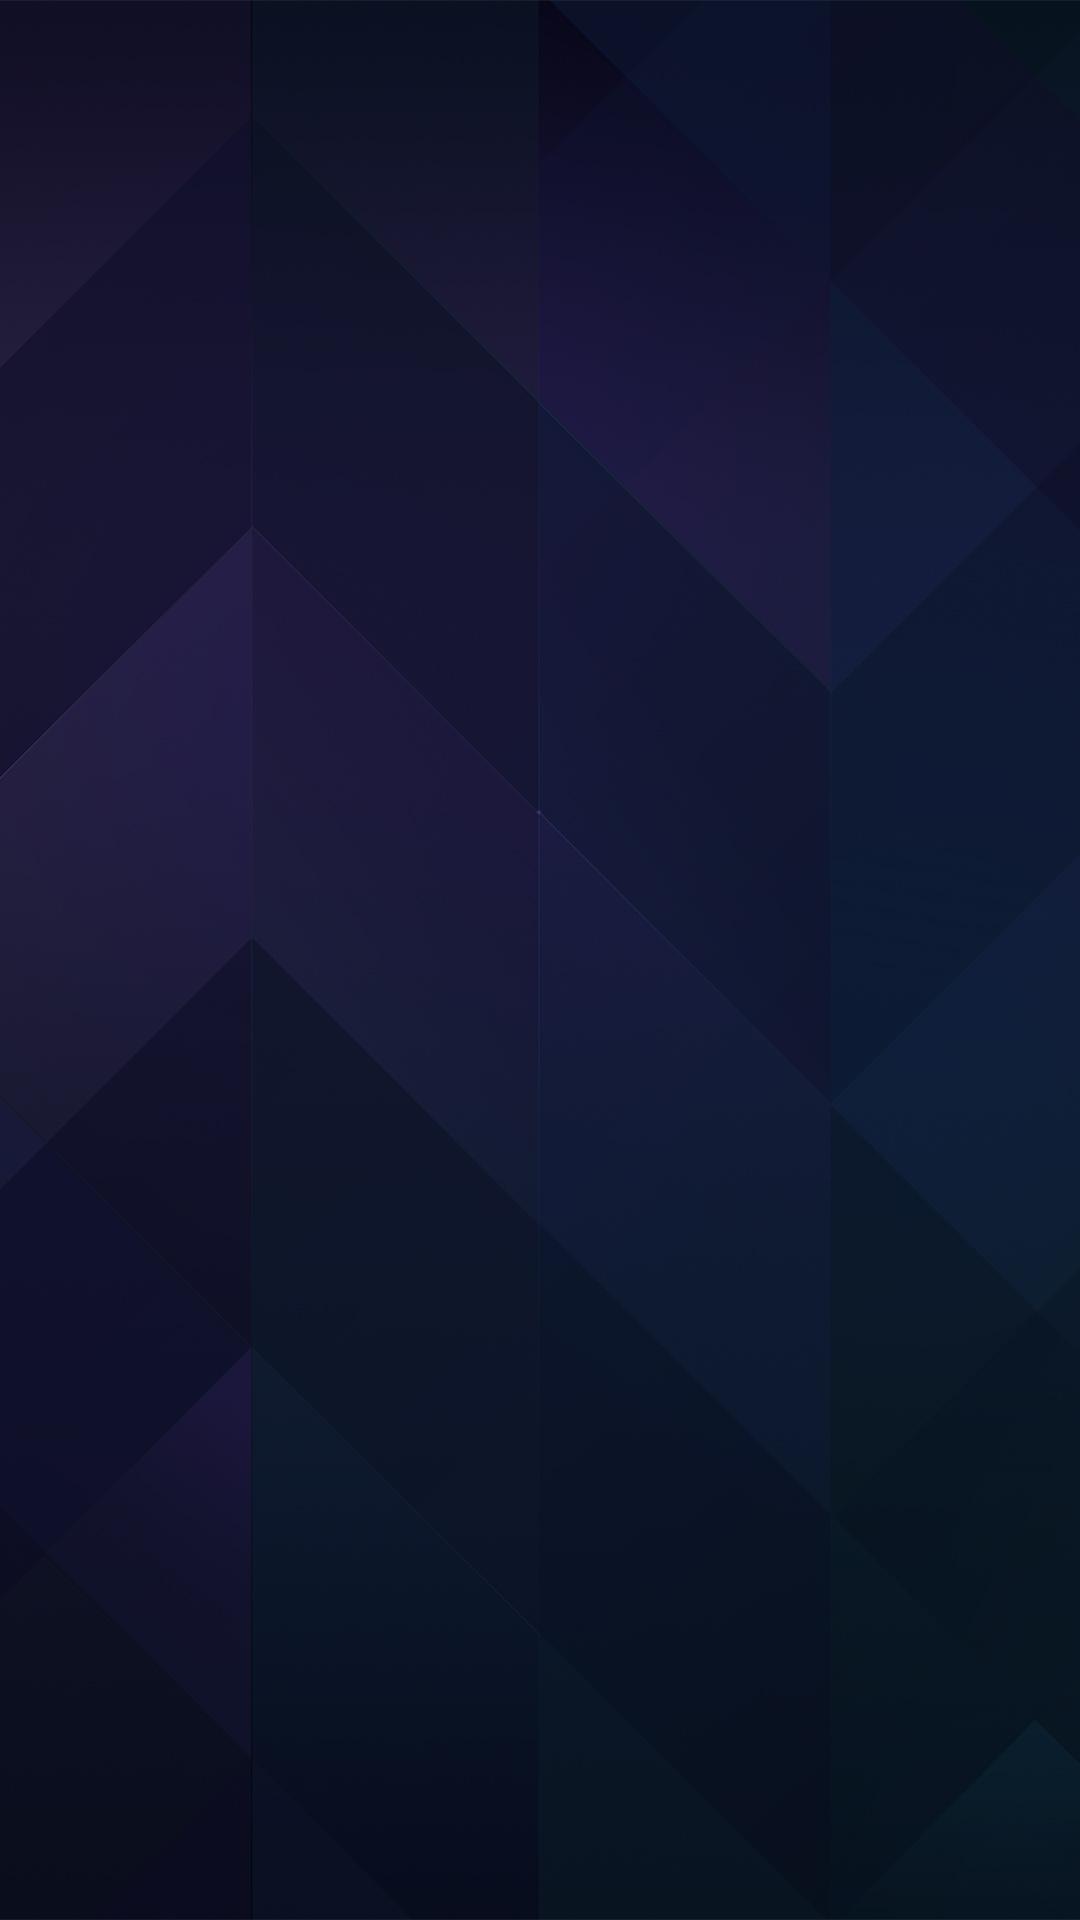 Android Wallpaper Meizu MX5